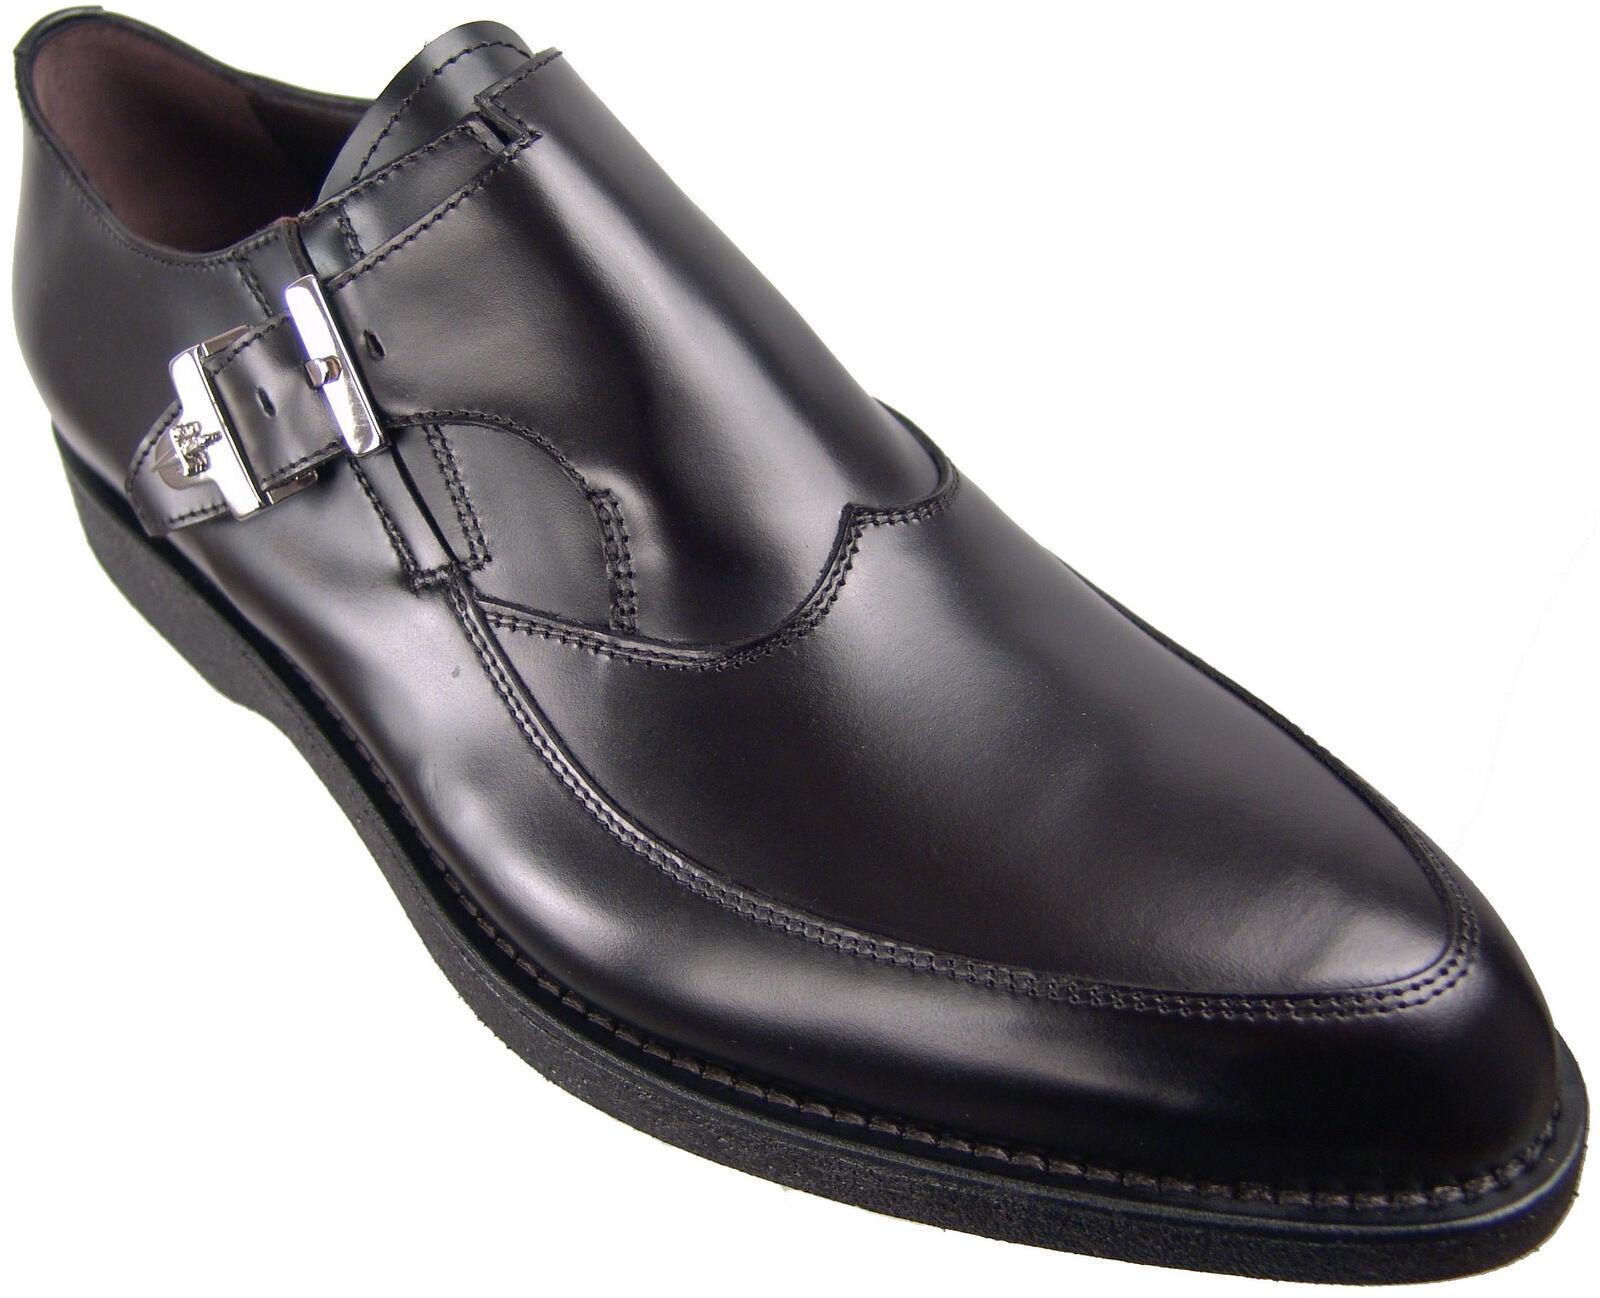 New Authentic  915 Cesare Paciotti US 7 Pelle Loafers Italian Designer Scarpe